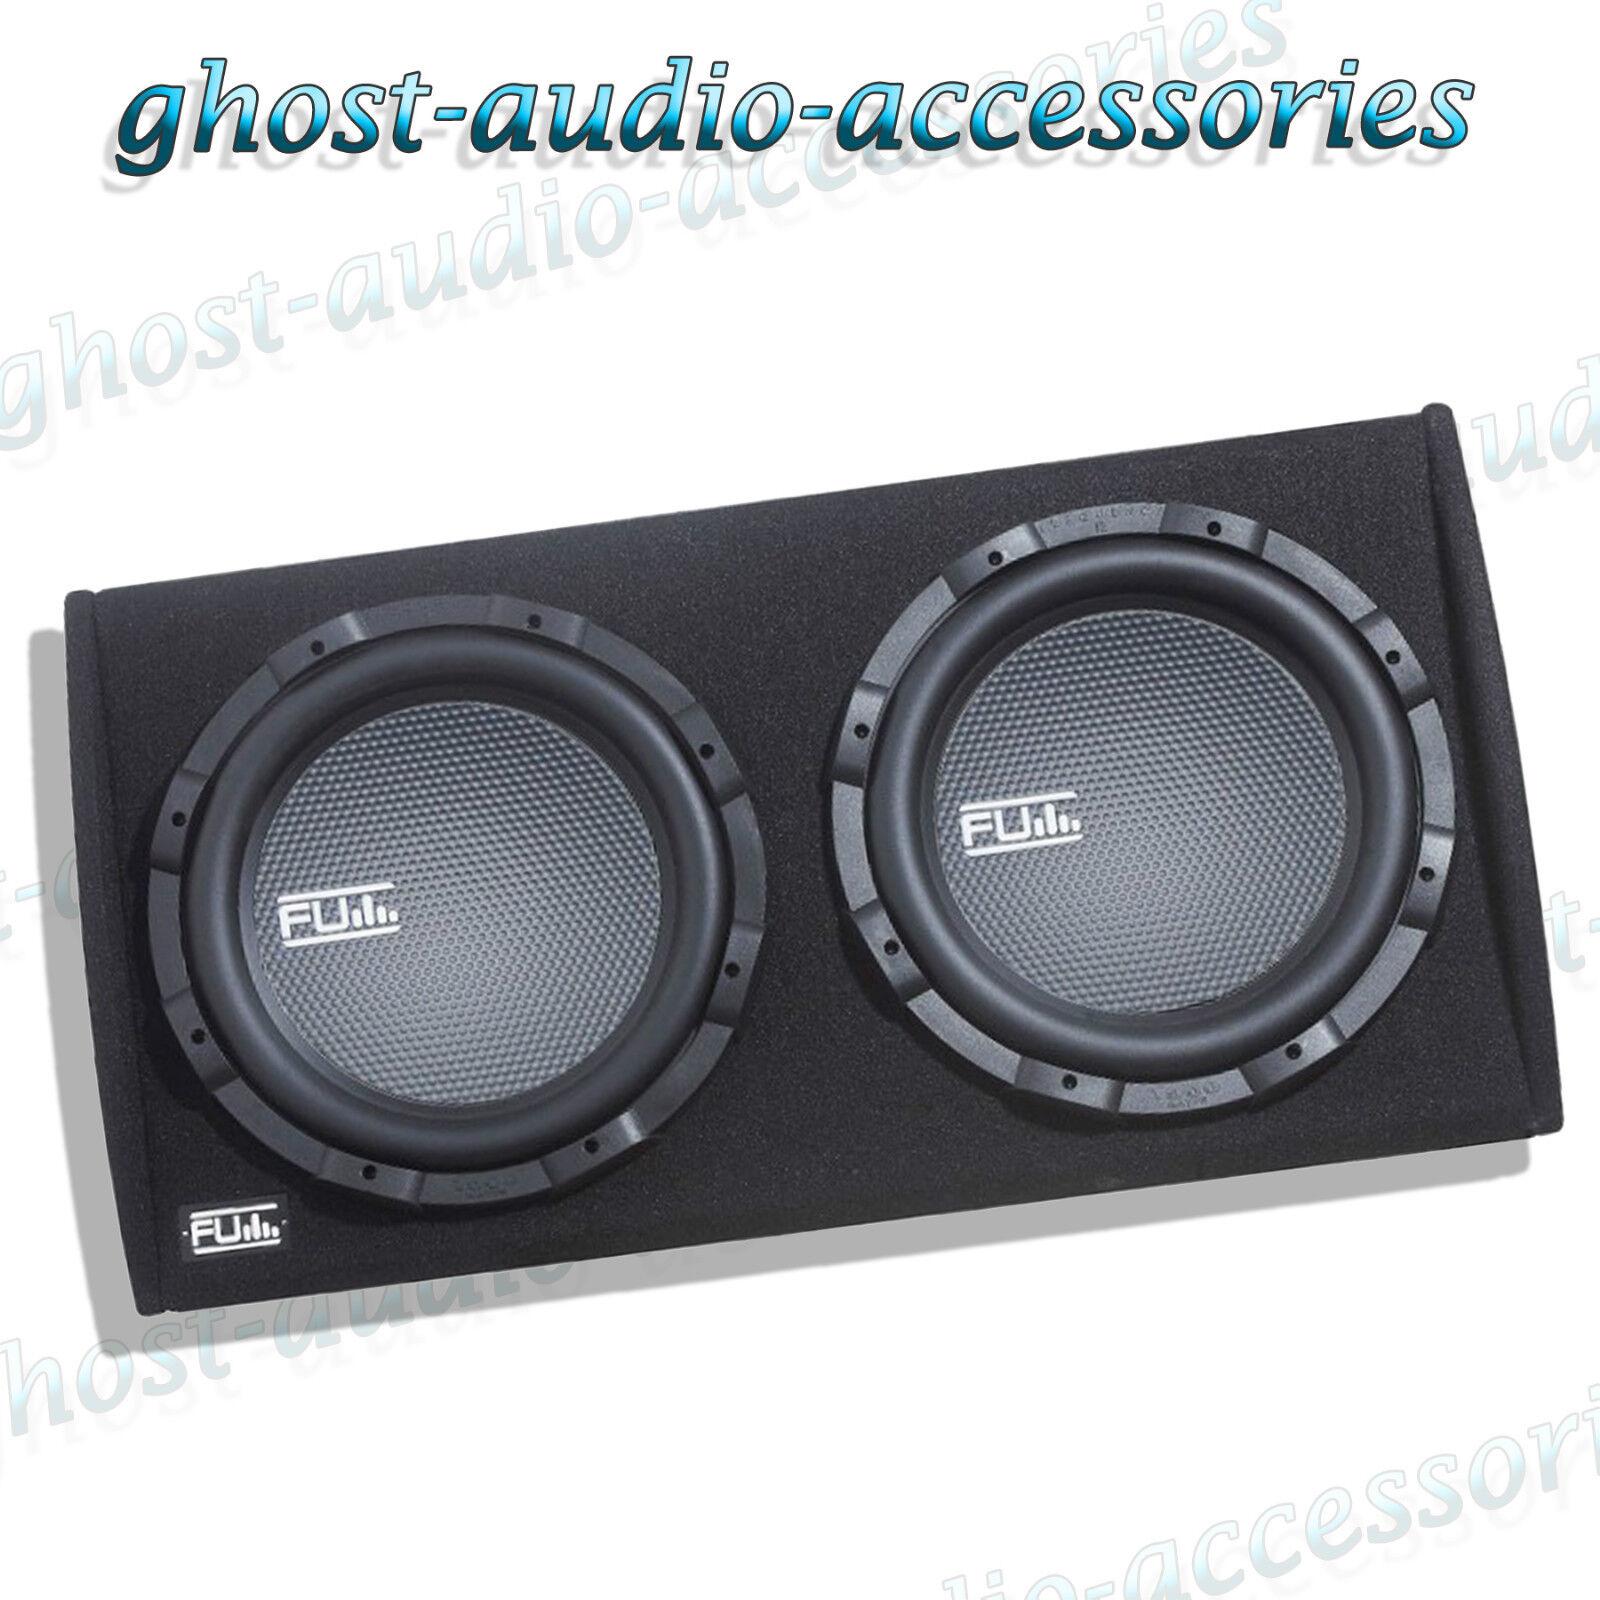 fli fu12at 12 twin active sub subwoofer enclosure boom speaker amp rh ebay com